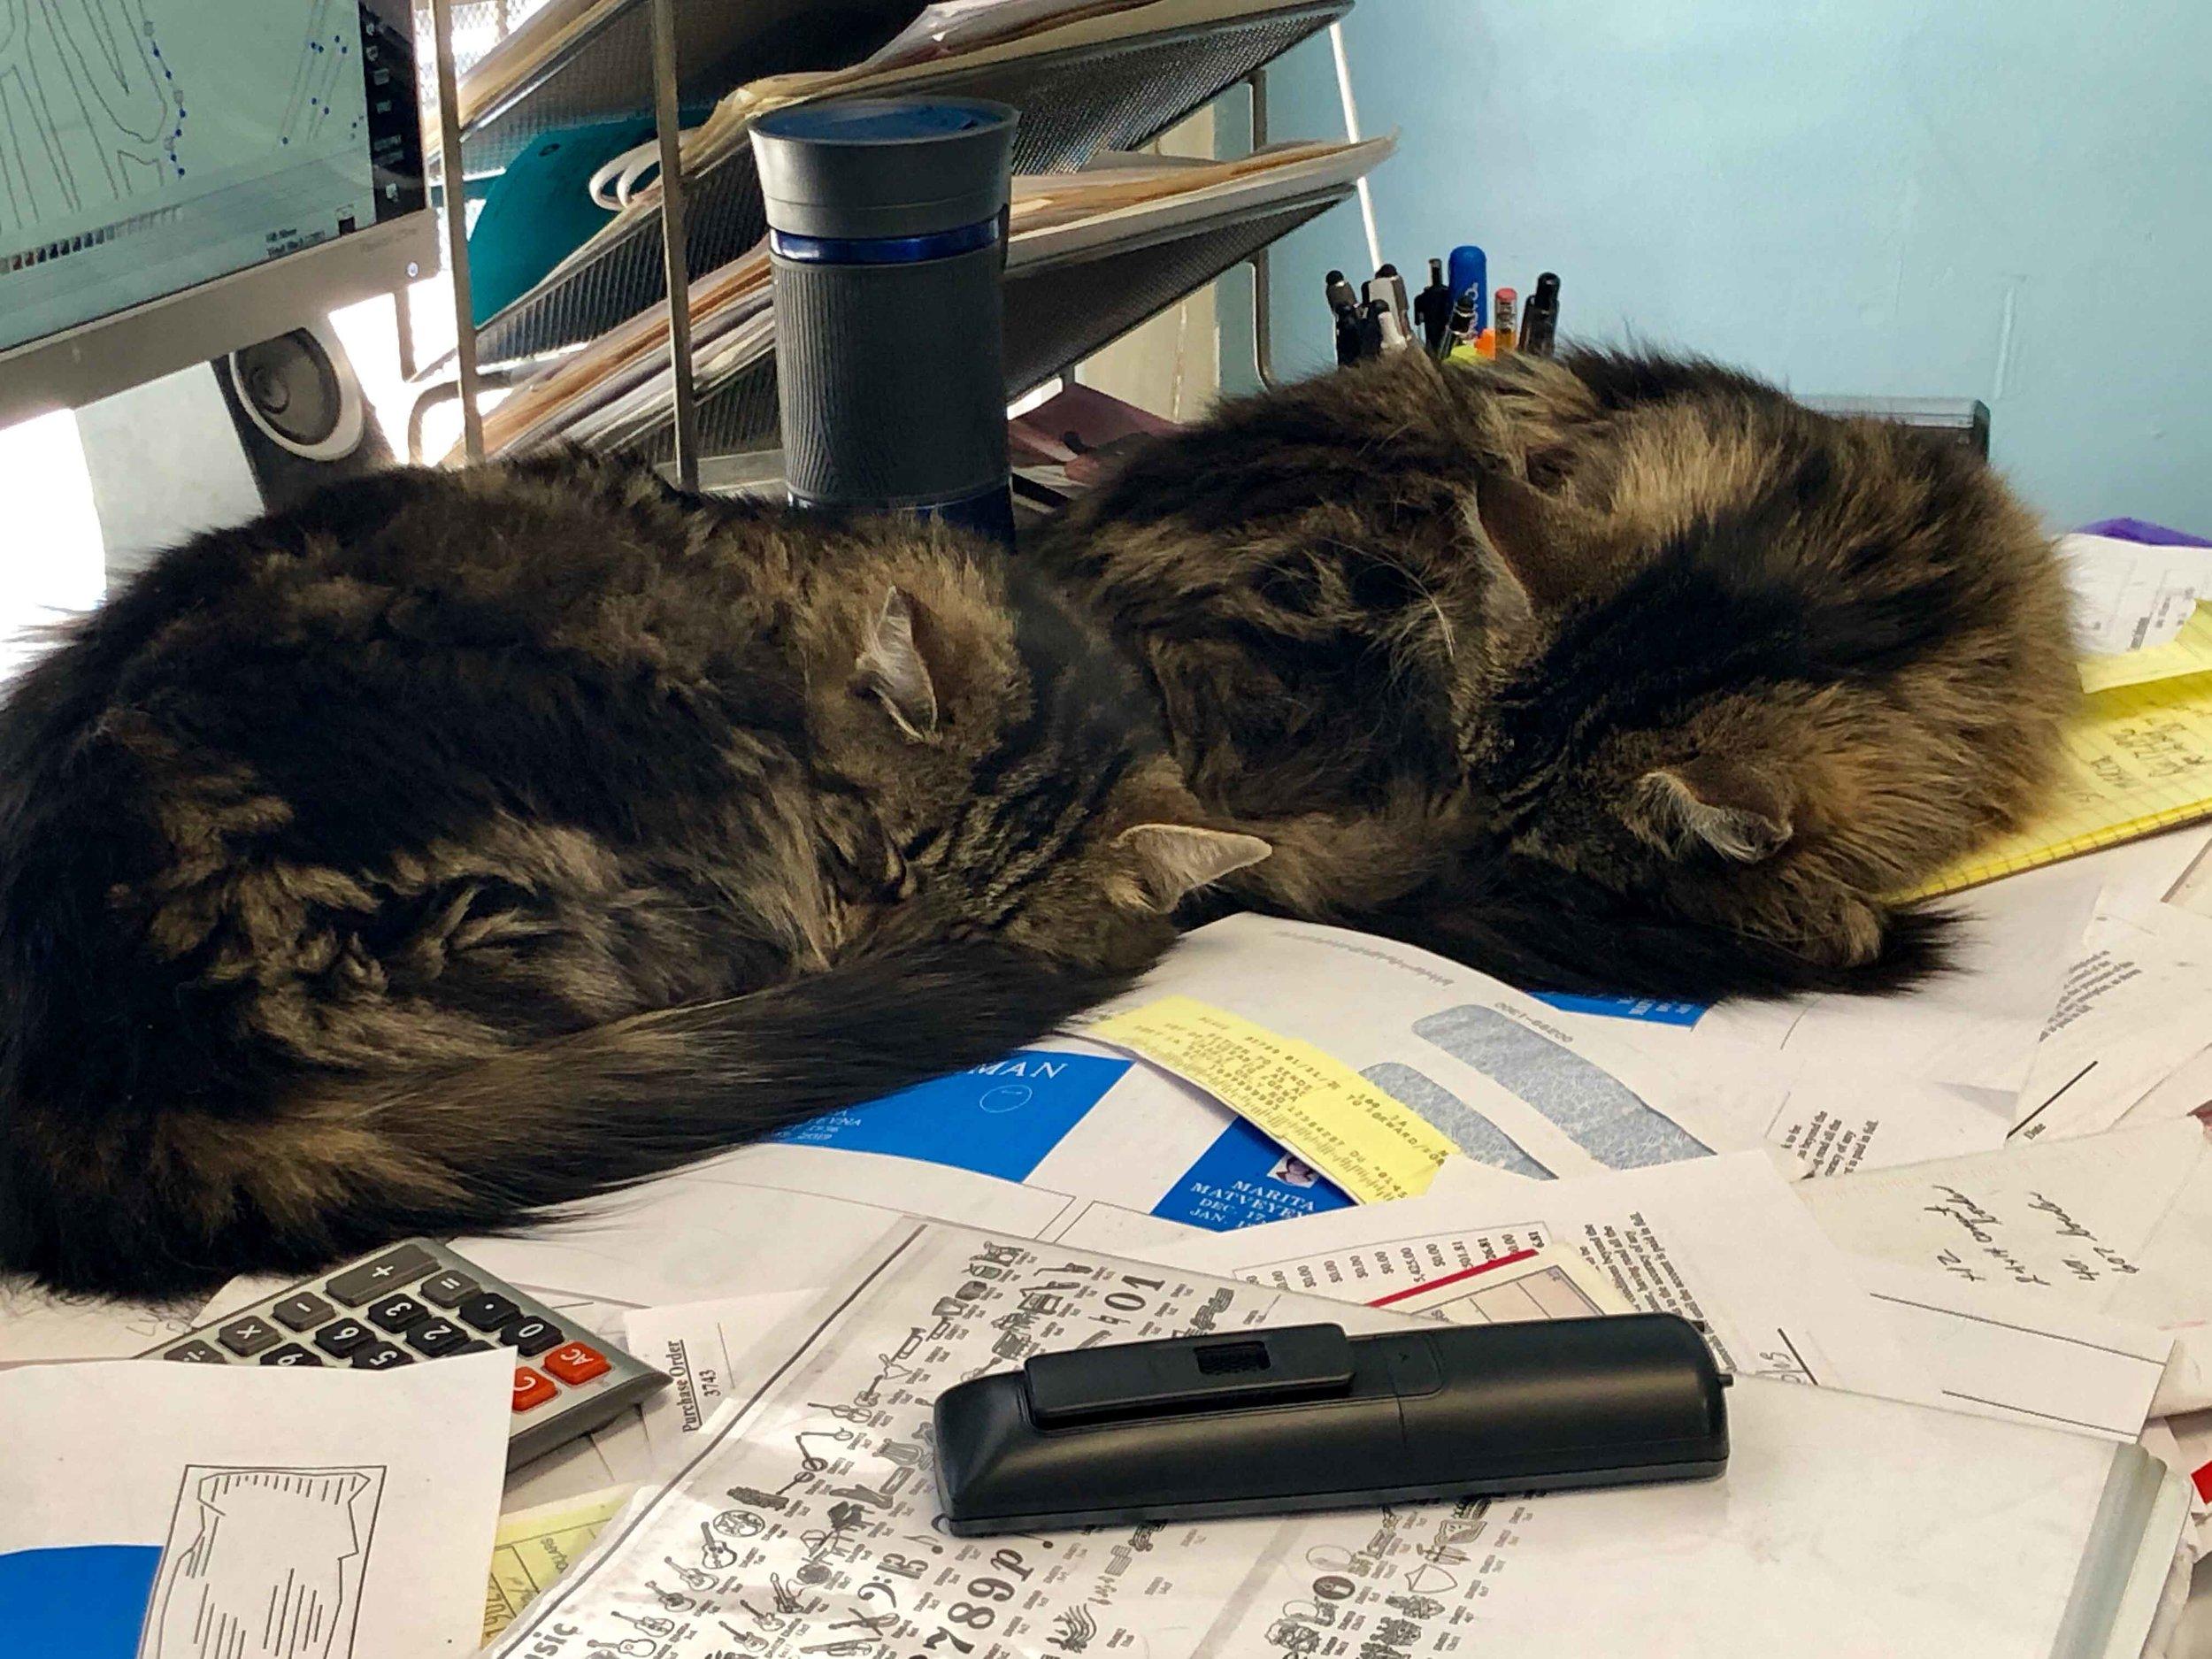 Twin kitties…I have twins too!